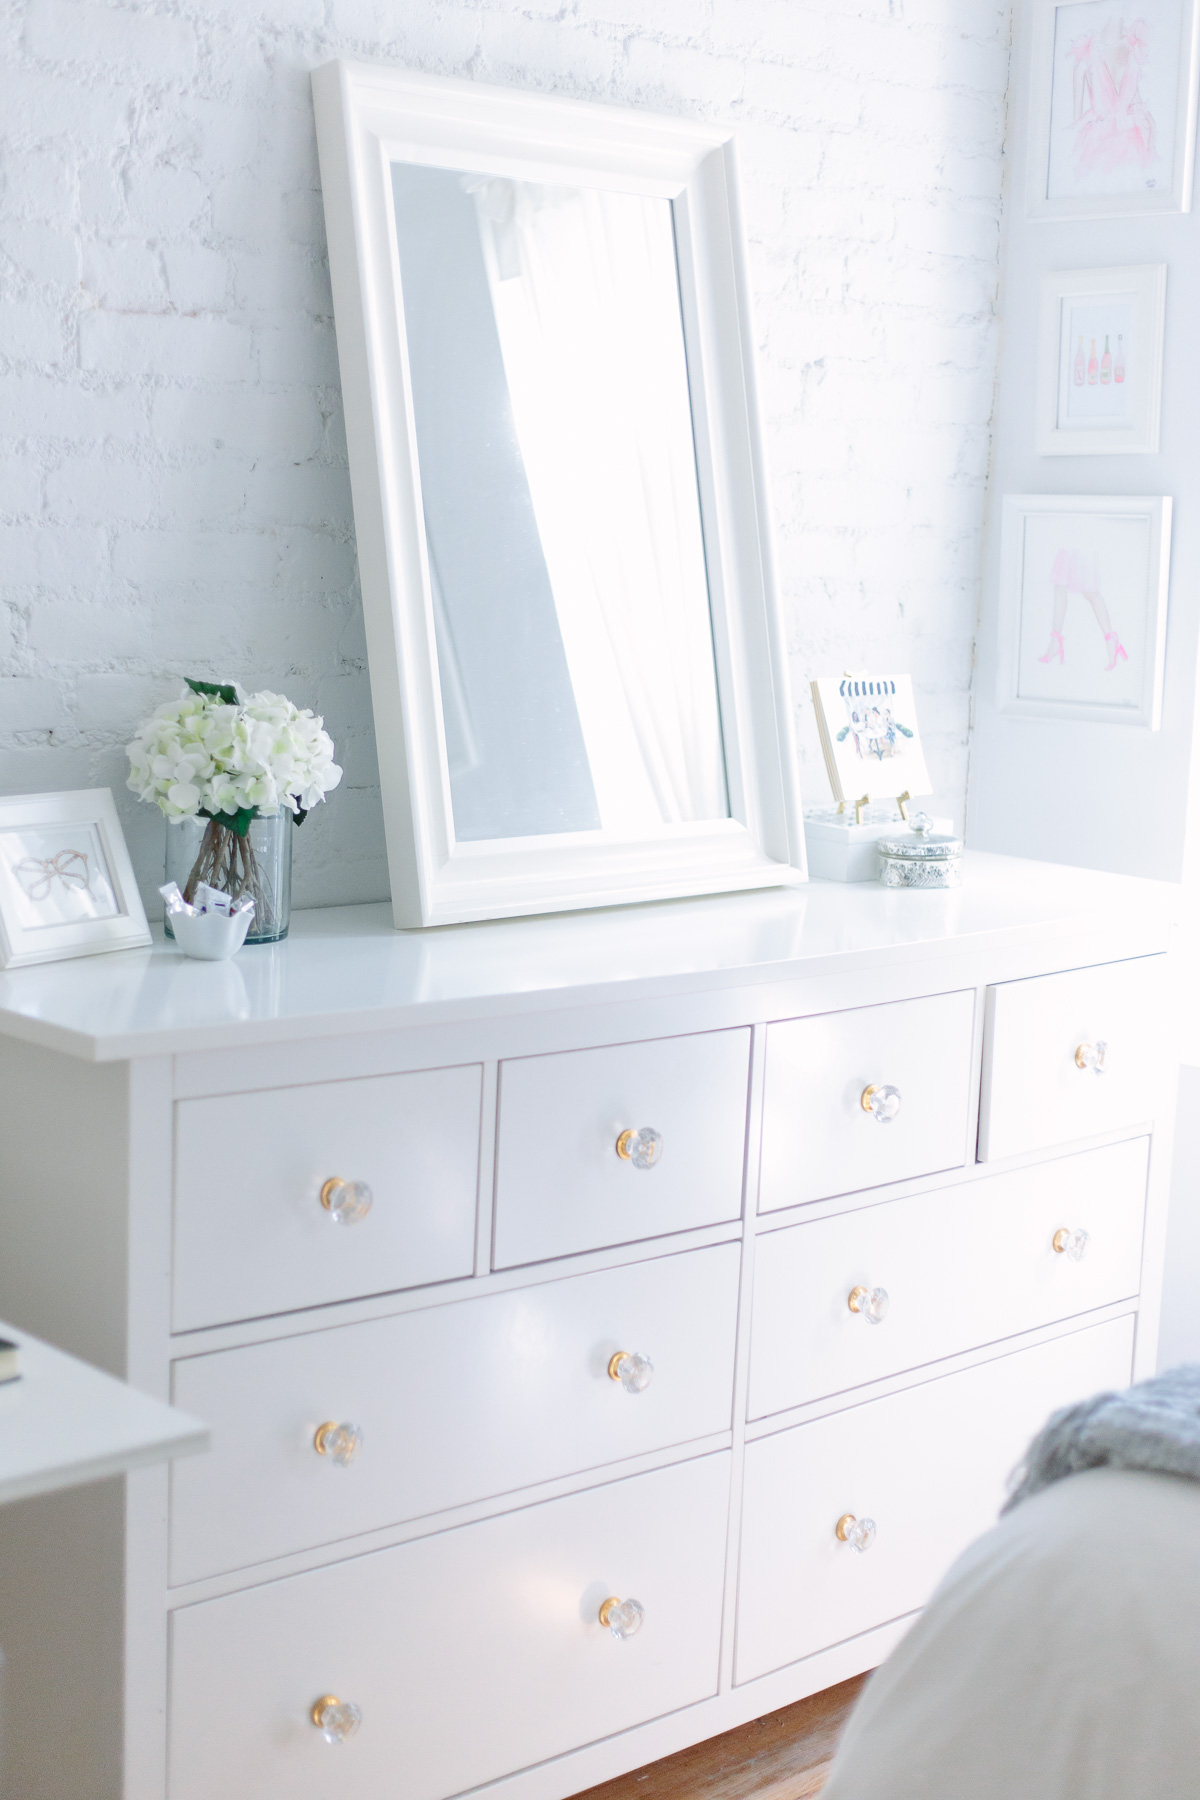 nyc-studio-apartment-white-painted-brick-wall-5821